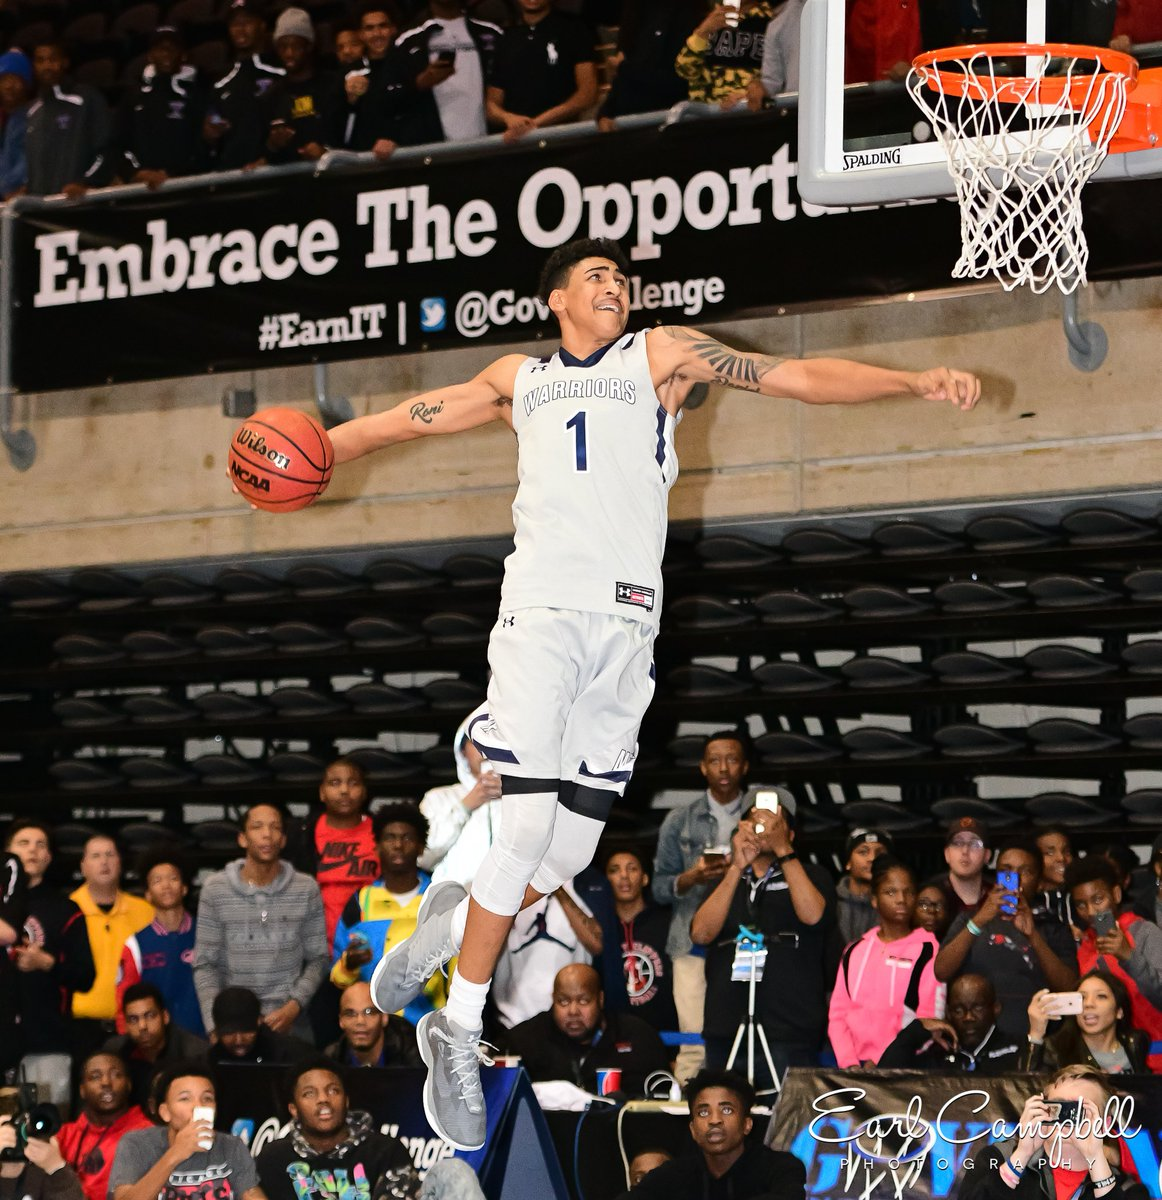 Rhode Island High School Basketball Game